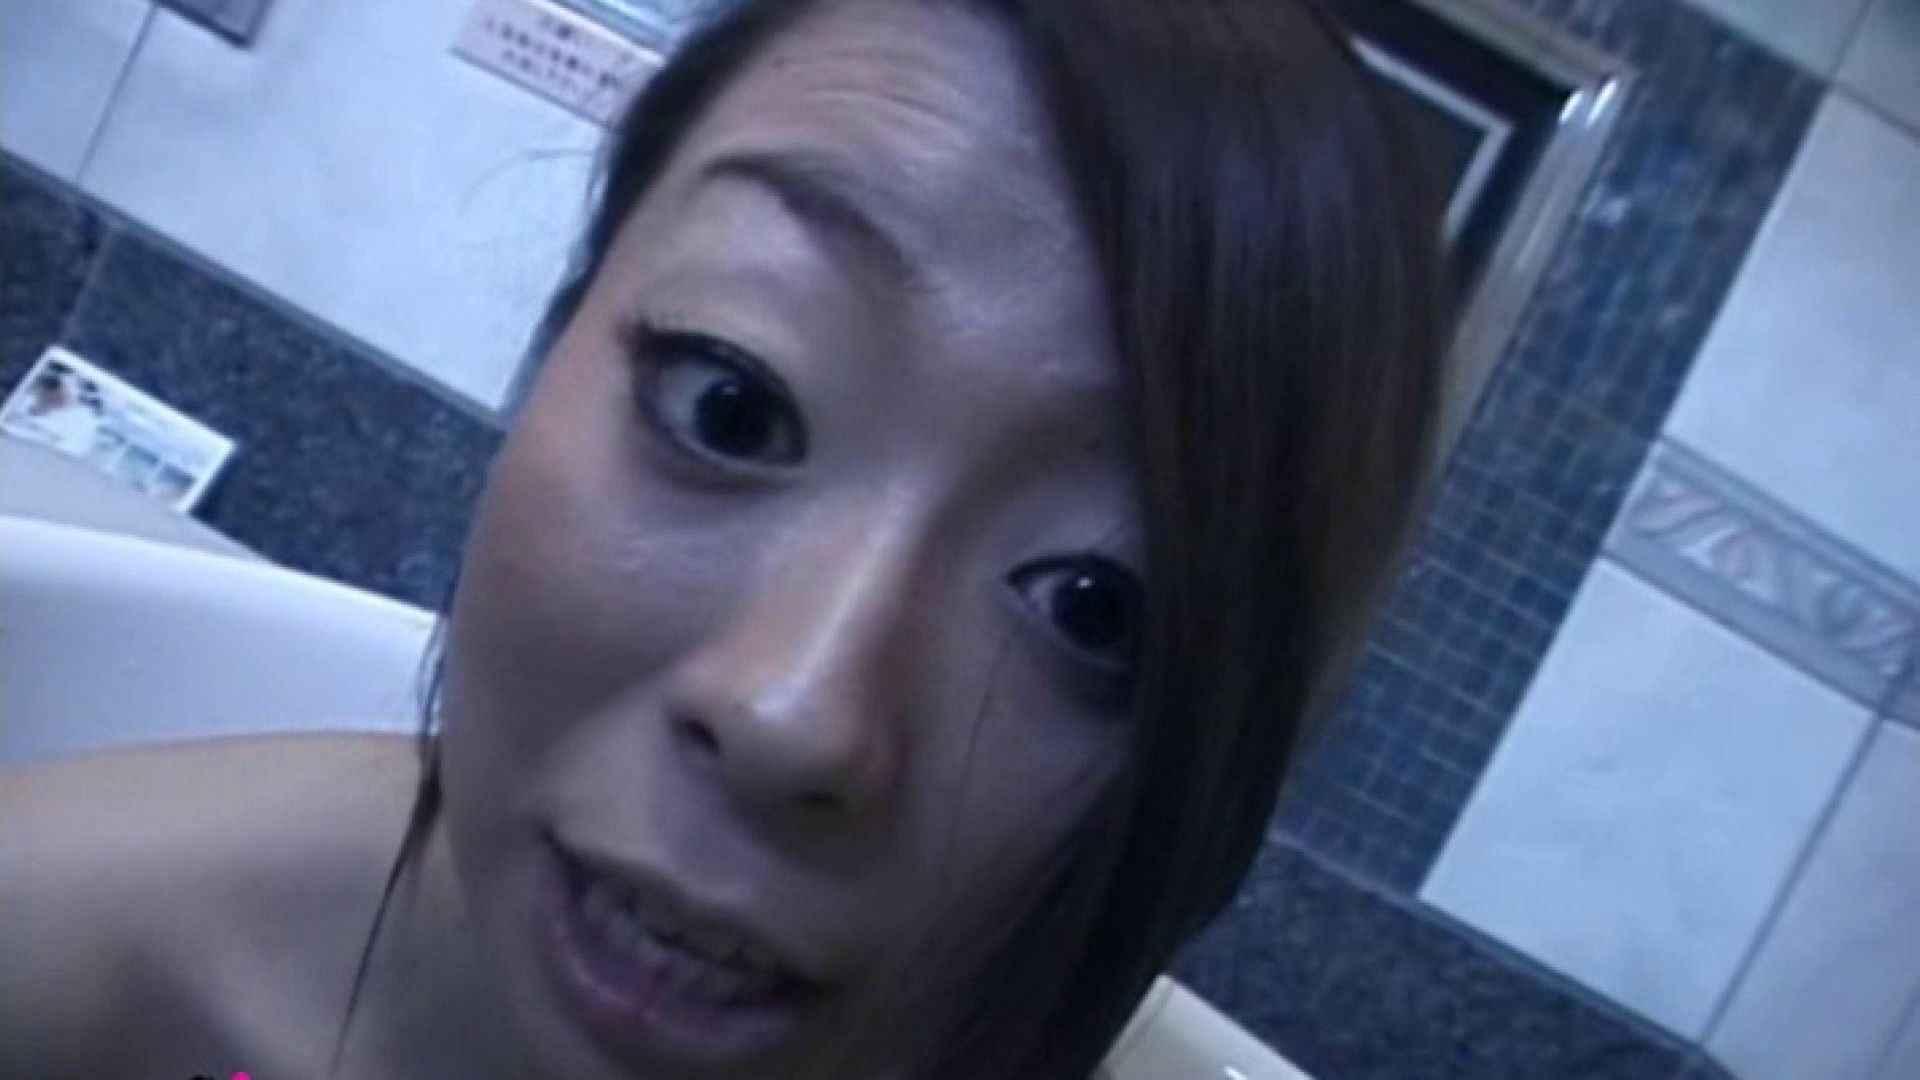 S級厳選美女ビッチガールVol.31 前編 美女エロ画像  99PICs 50